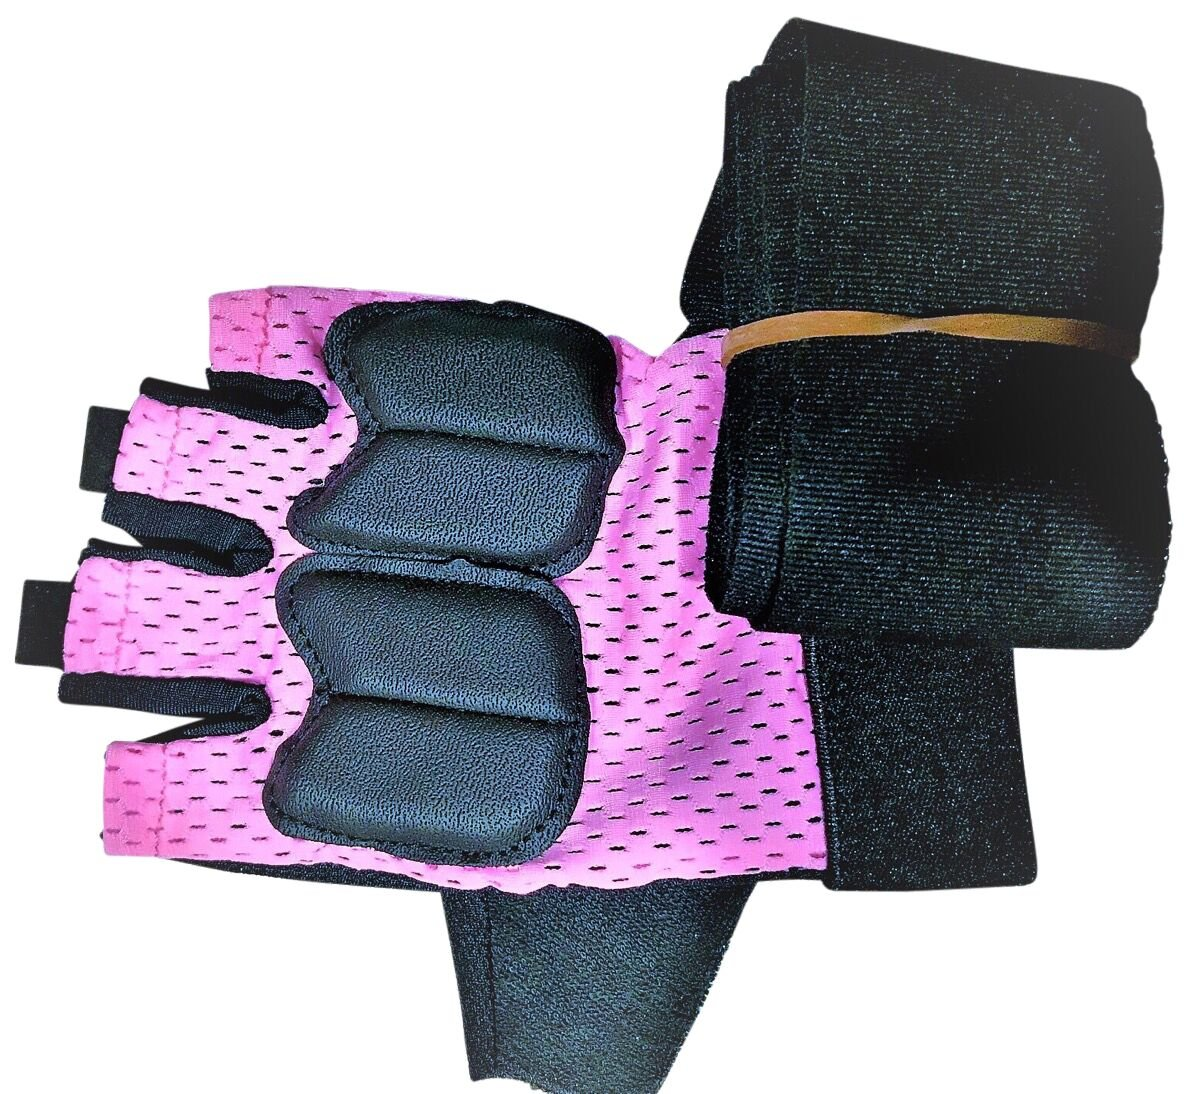 Zetiling Boxing Hand Wrap Boxing Kickboxing Hand Wraps Herramienta de protecci/ón Deportiva Ideal para Profesionales o Aficionados